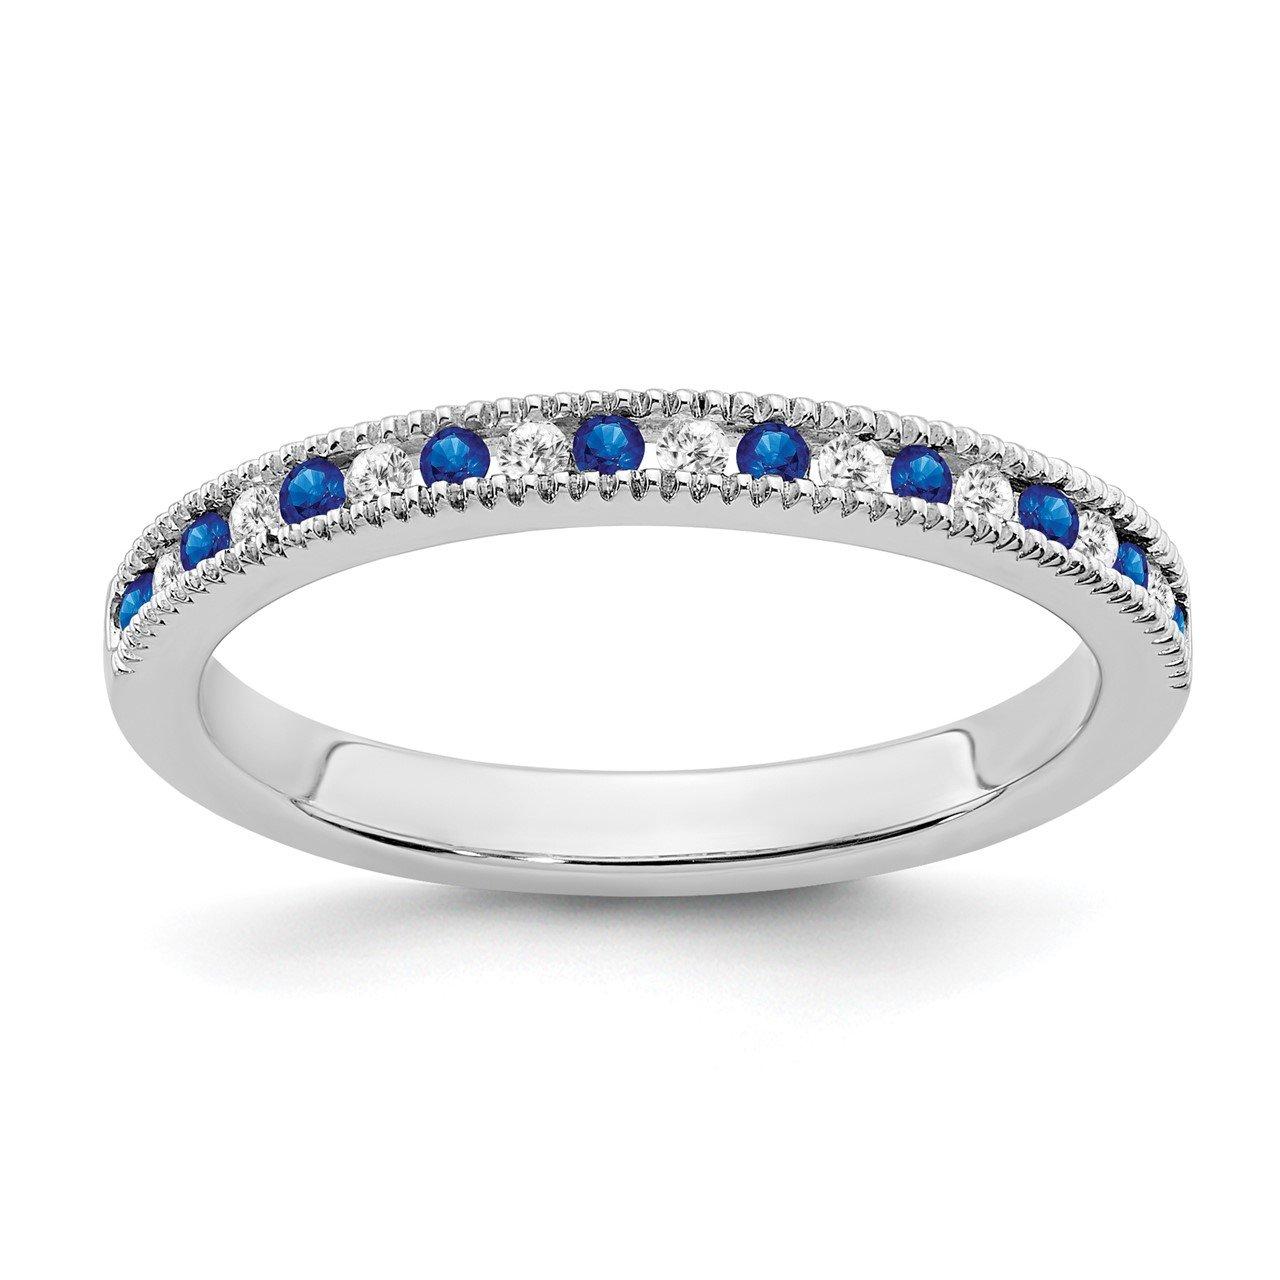 14k White Gold Sapphire and Diamond Band